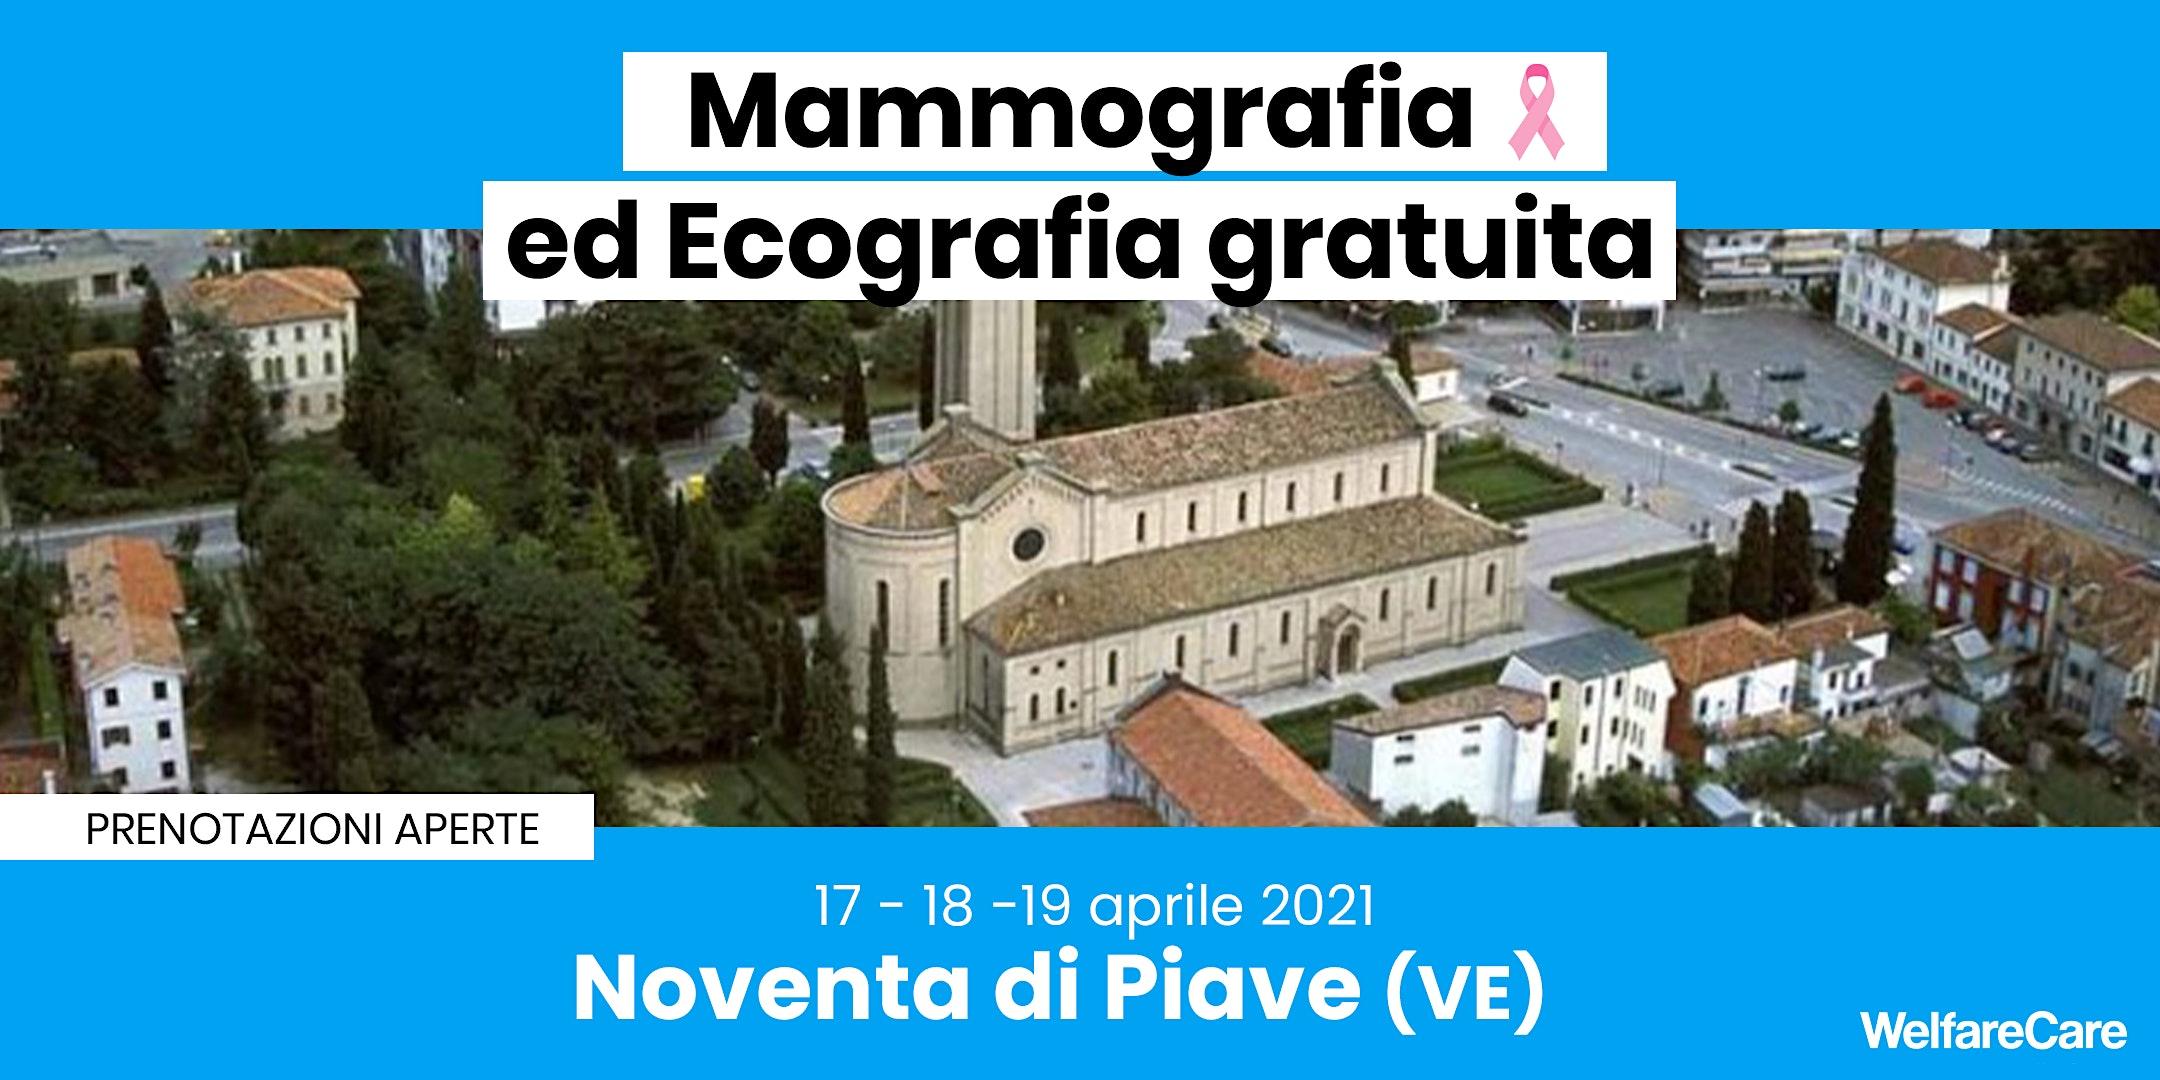 Mammografia ed Ecografia Gratuita – Noventa di Piave 17-18-19 aprile 2021